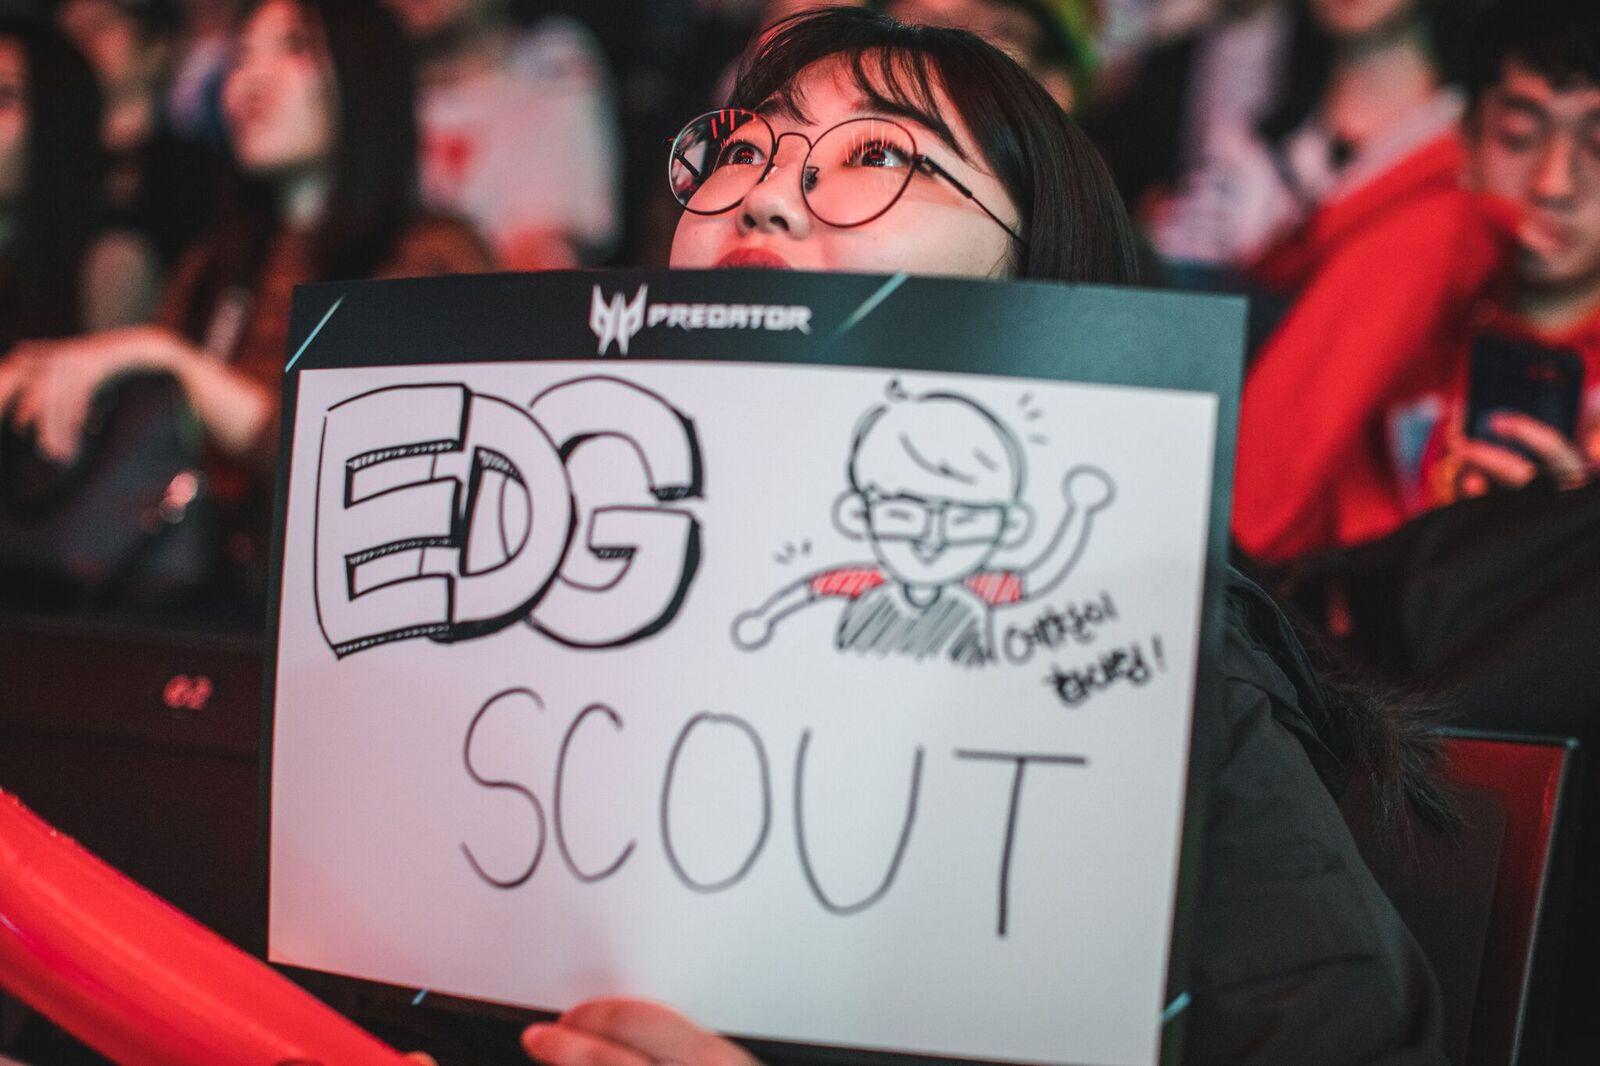 Fan de EDG mostrando su apoyo a Scout